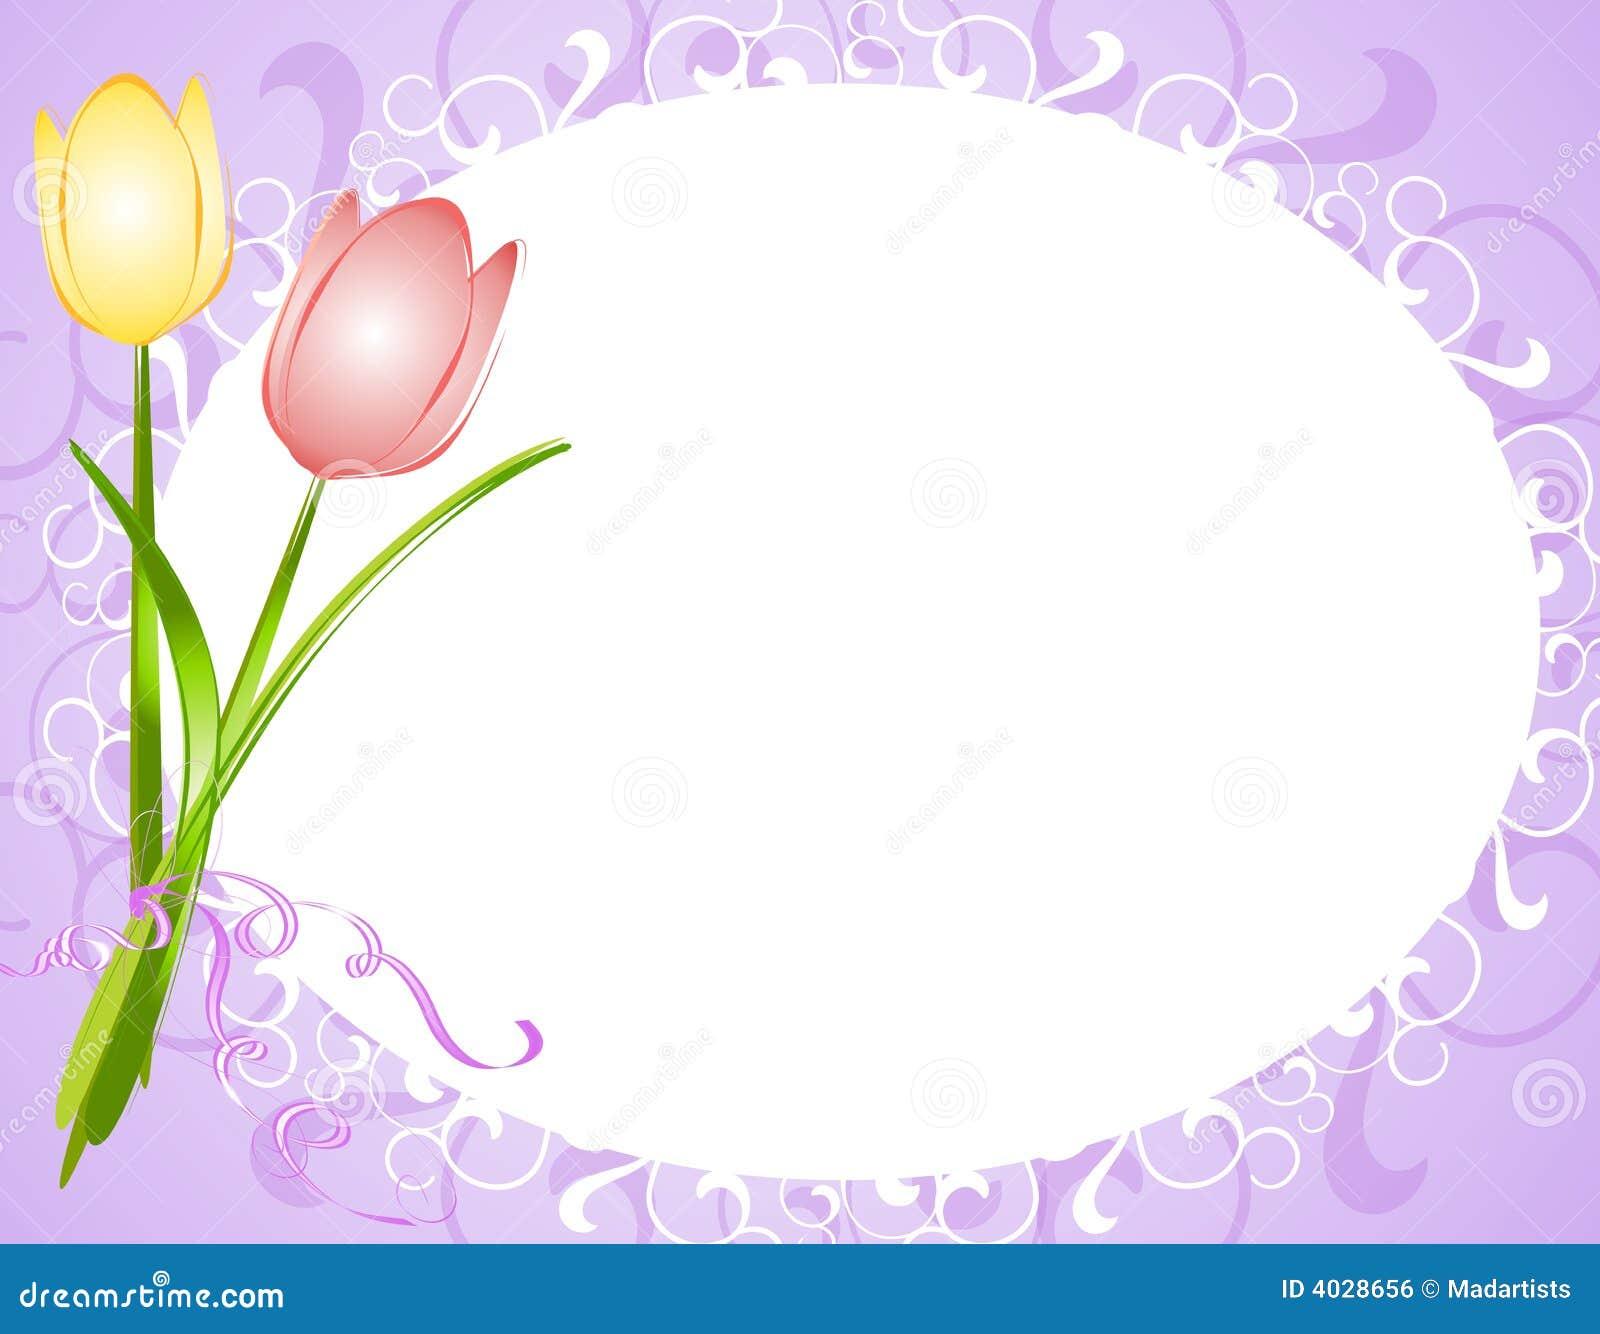 Purple Oval Tulips Flower Frame Border Royalty Free Stock Image ...